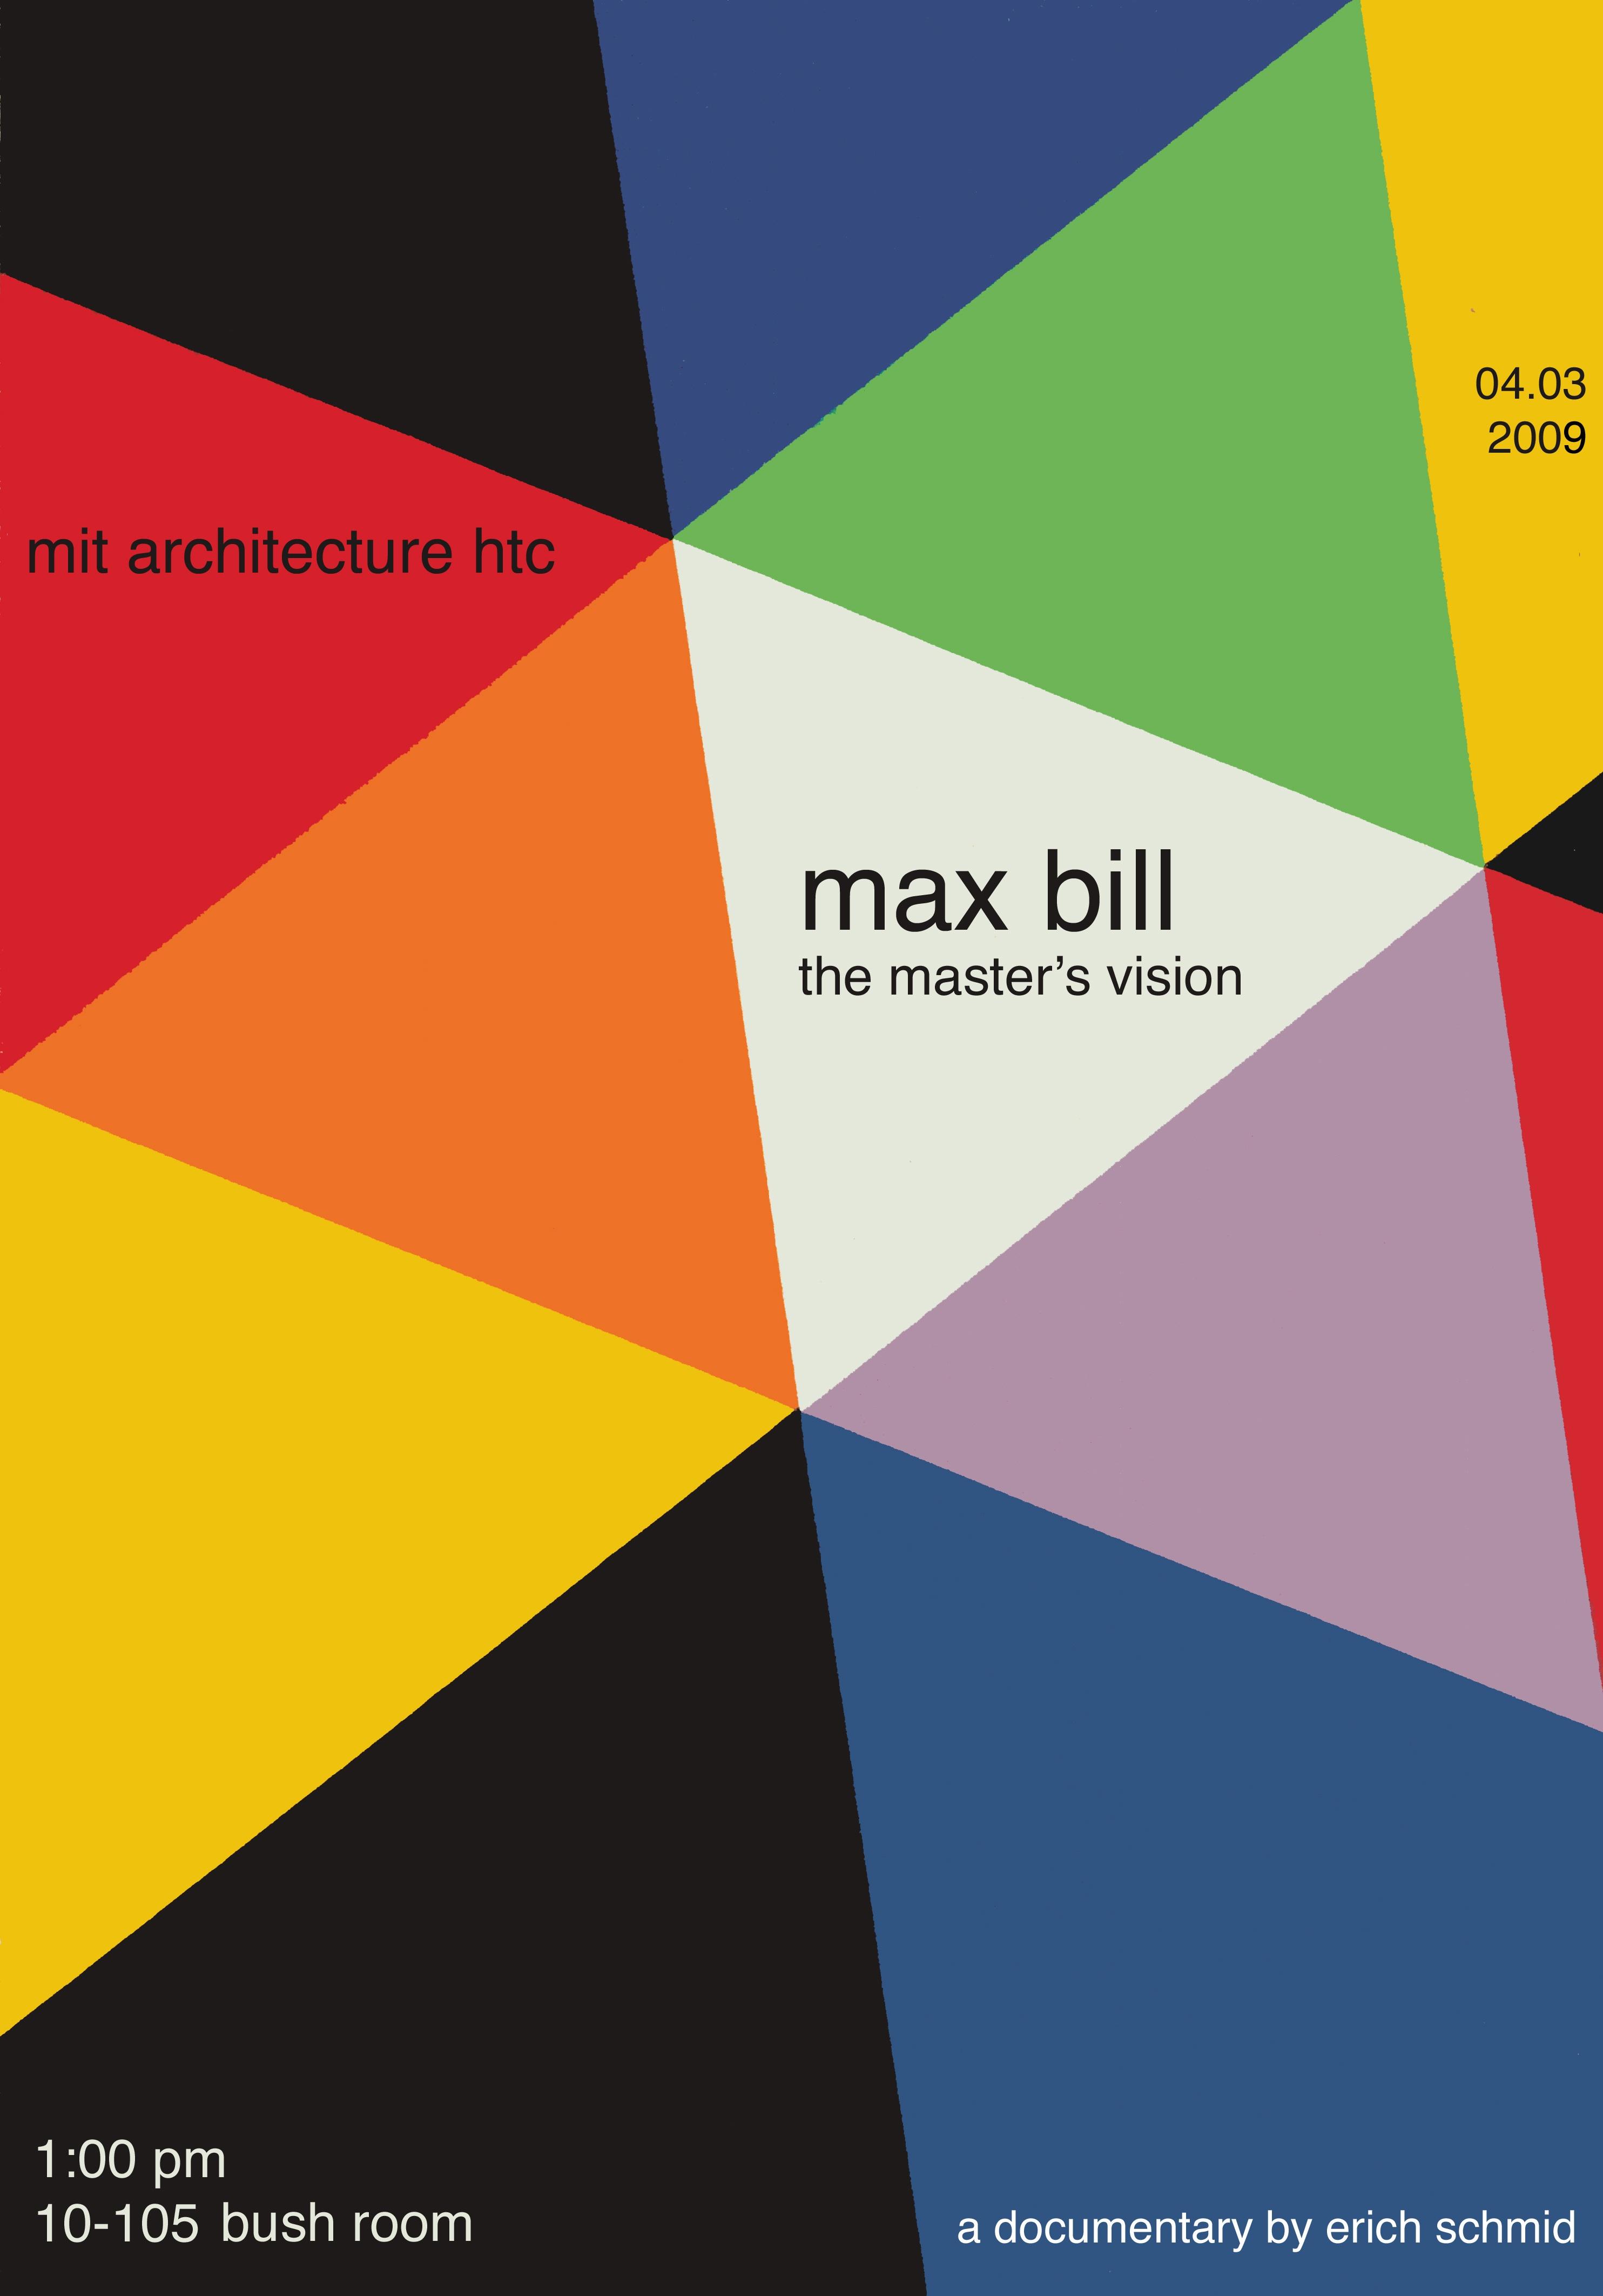 max-bill-poster-color-2-4